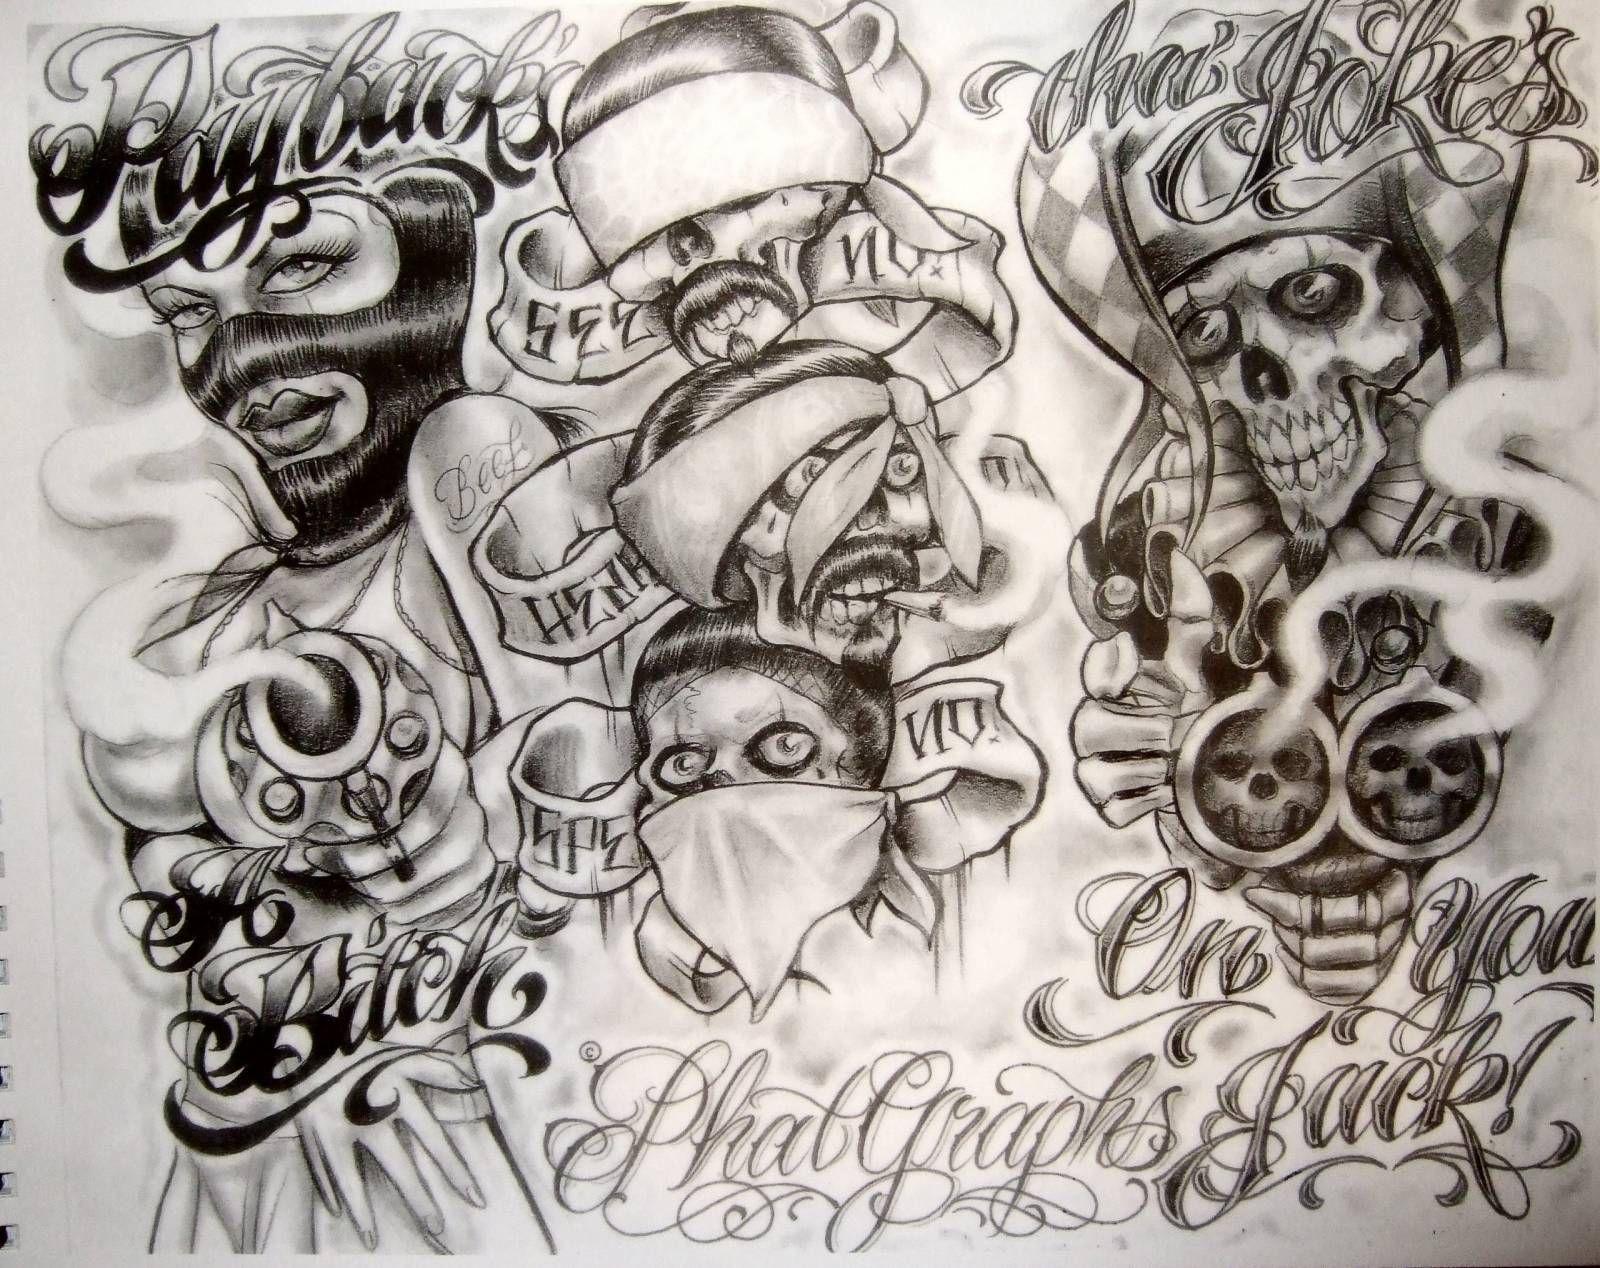 Sohranyonnye Fotografii 479 Fotografij Chicano Art Tattoos Chicano Drawings Sketch Tattoo Design